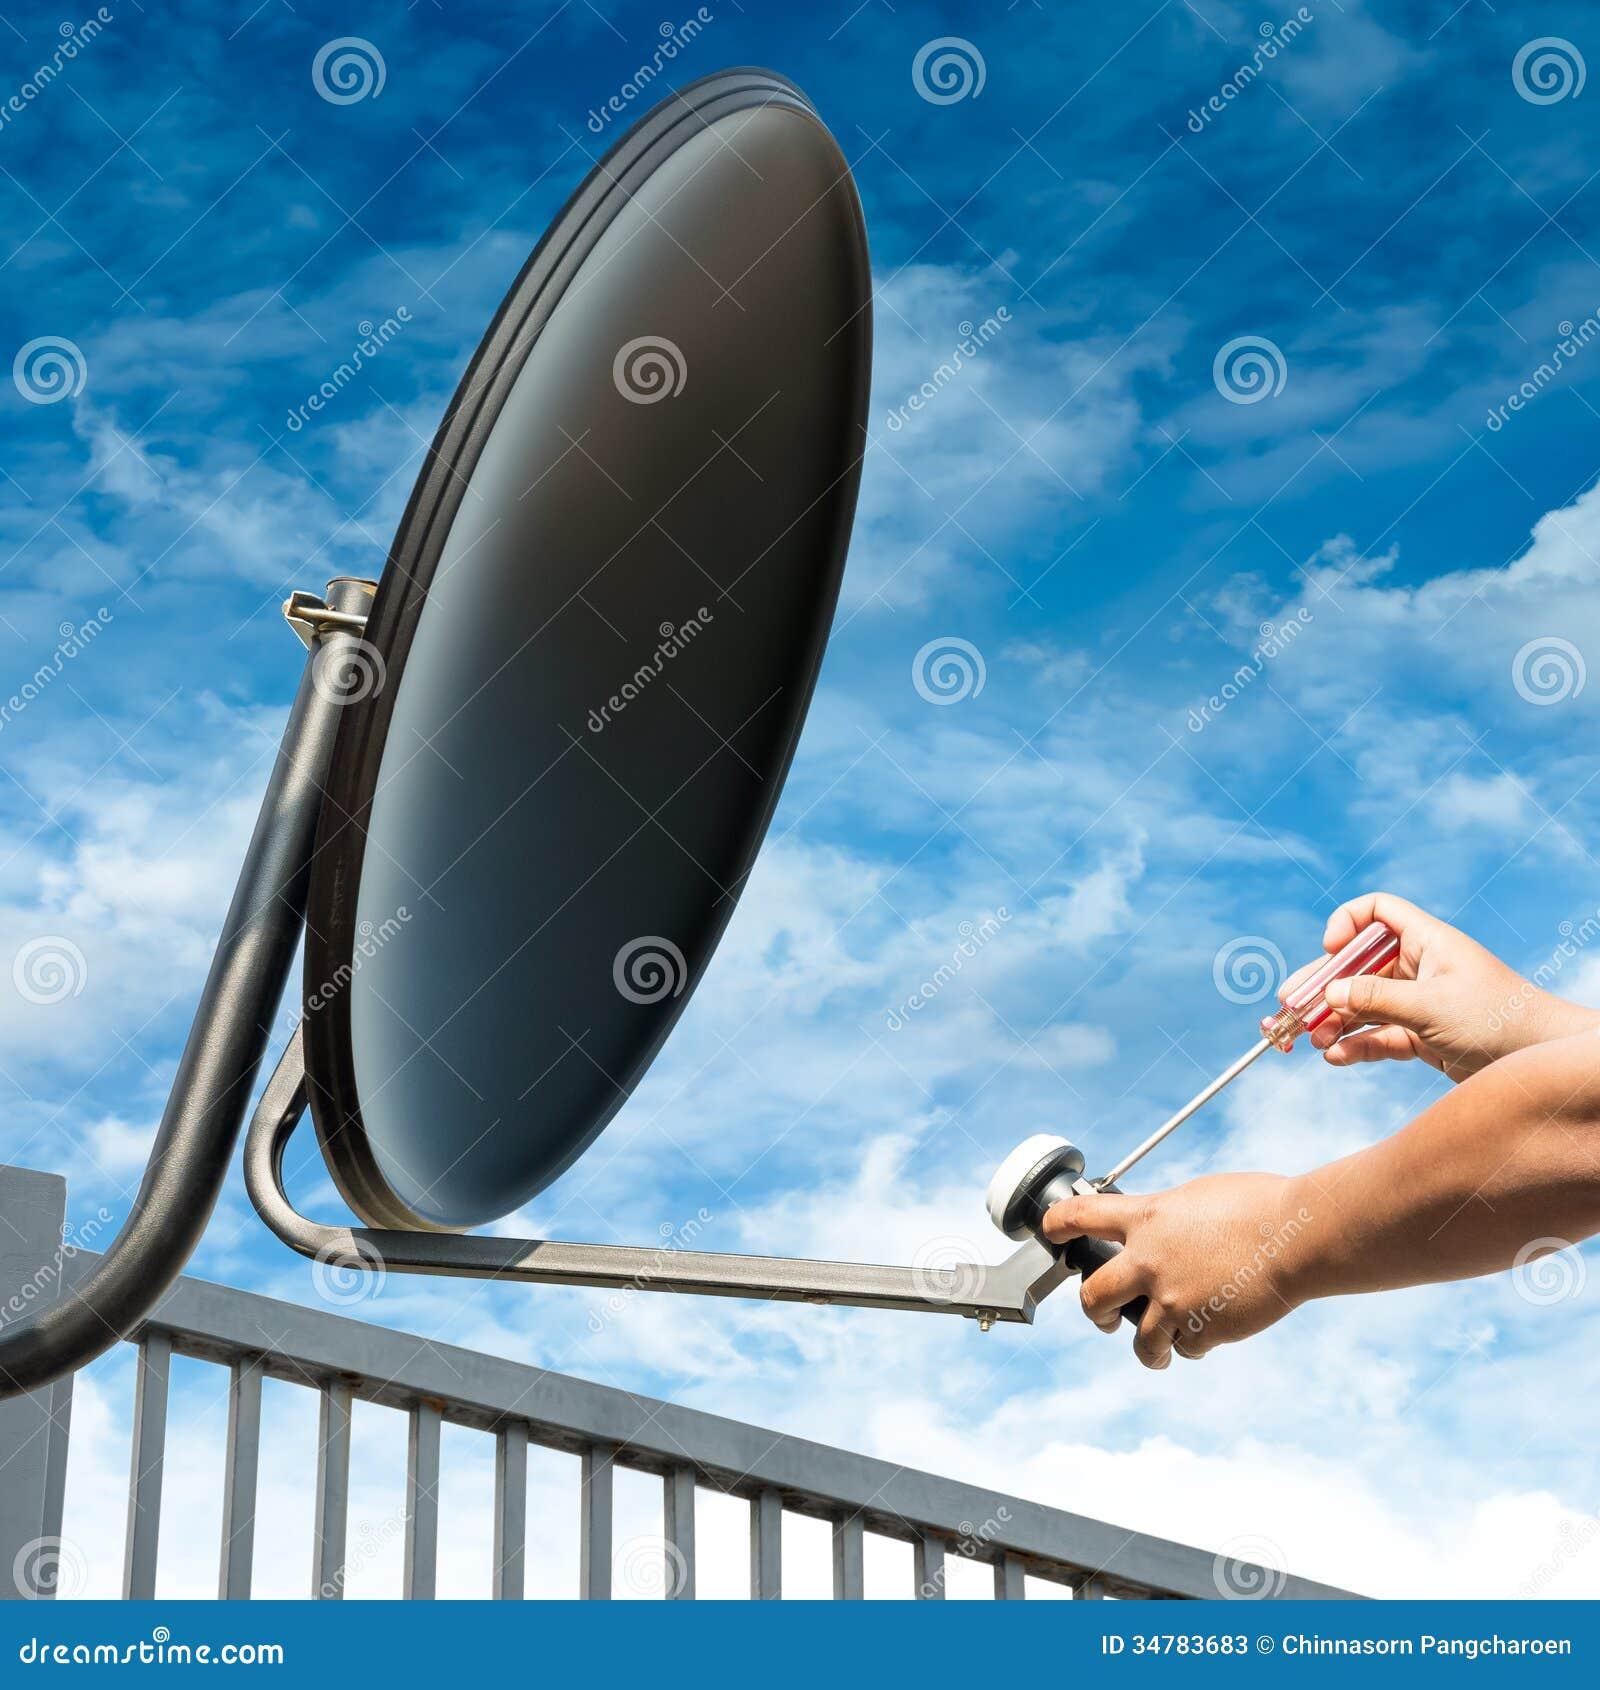 Craftsman Repair Satellite Dish Stock Image Image Of Broadband